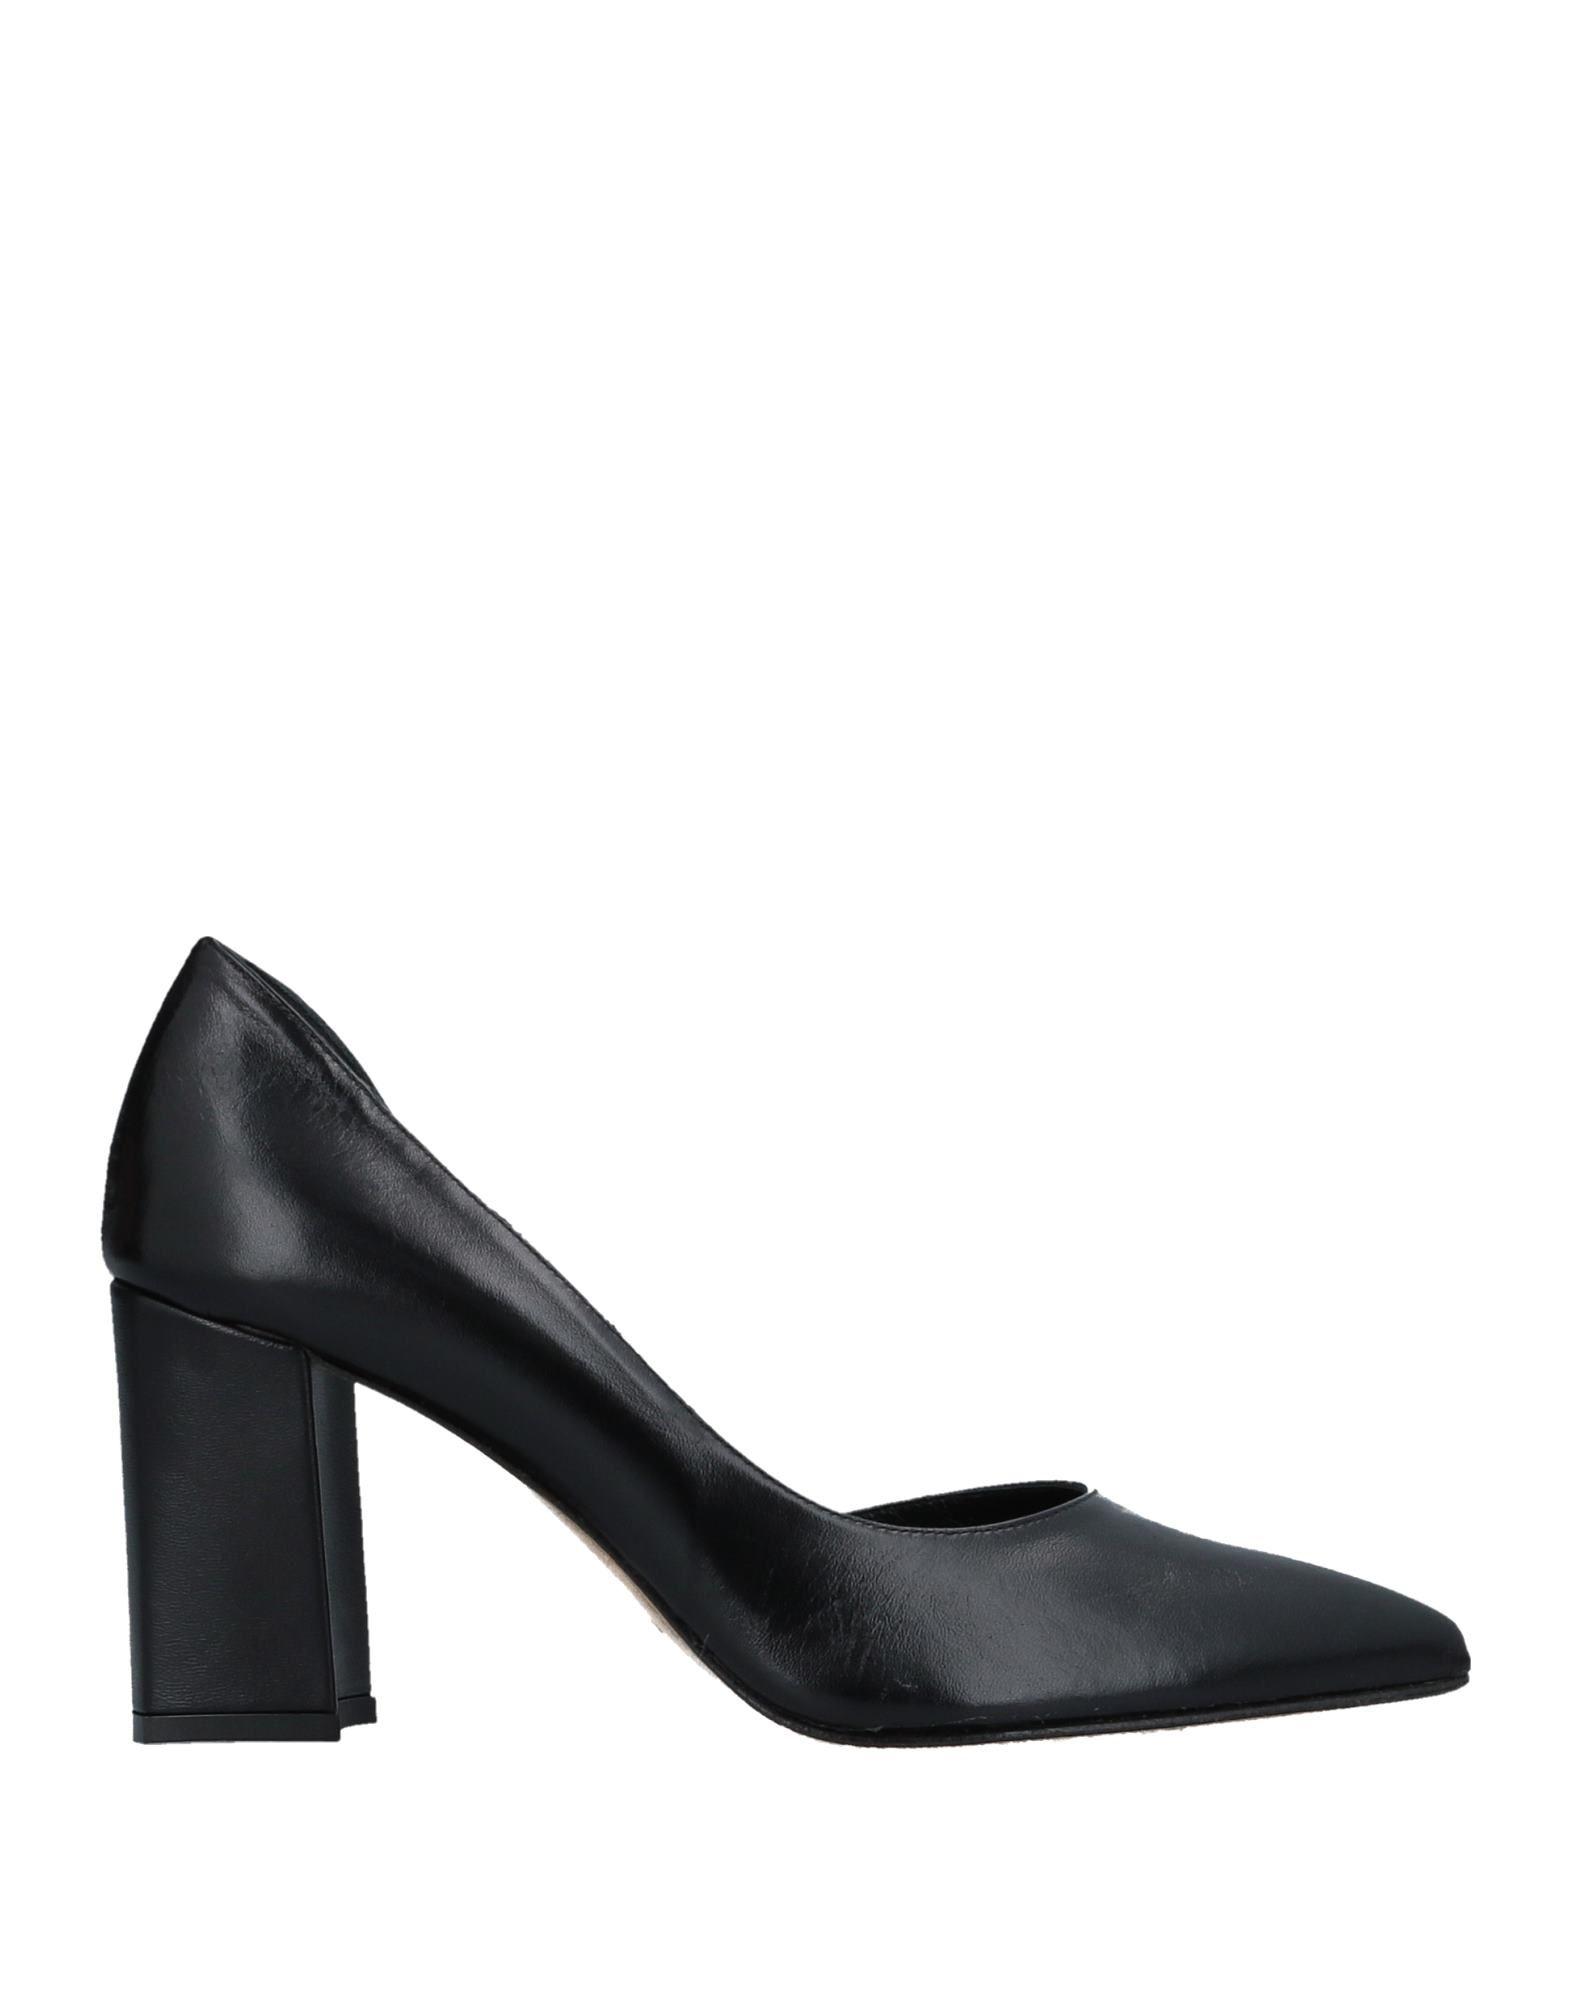 Mauro 11507713KS Fedeli Pumps Damen  11507713KS Mauro Gute Qualität beliebte Schuhe 203cd6